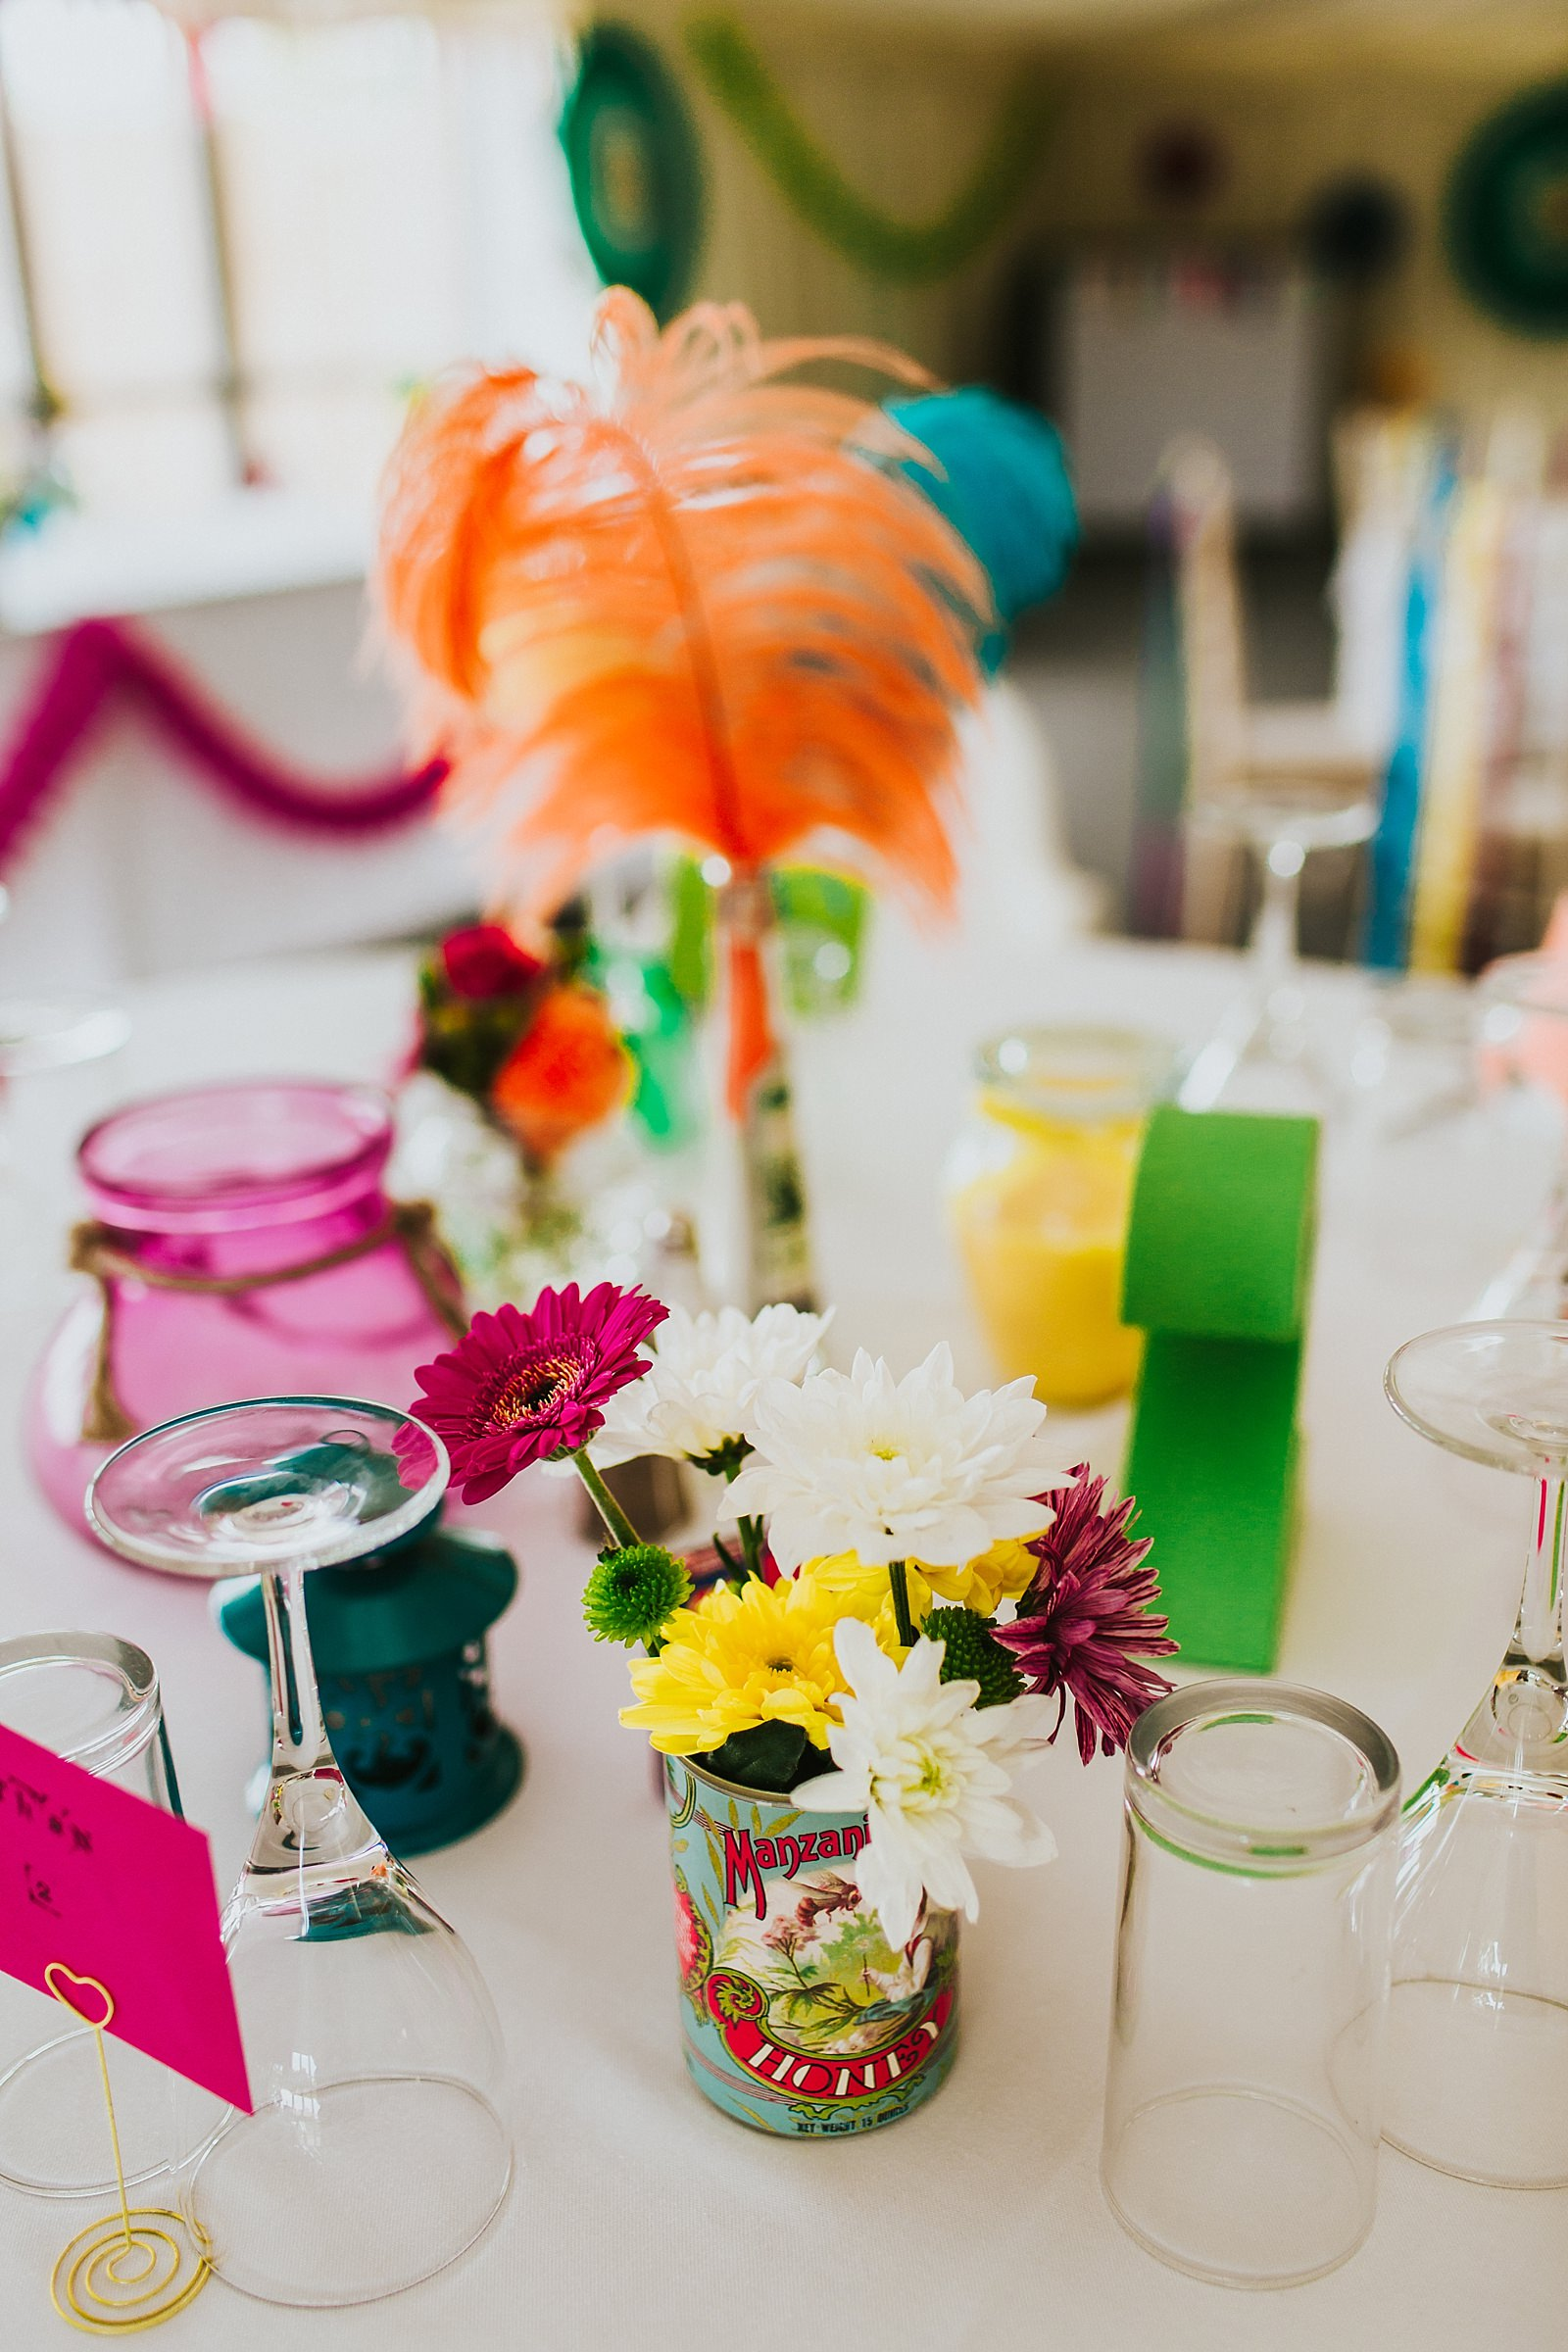 granary-at-fawsly-wedding-paula-stephen-032